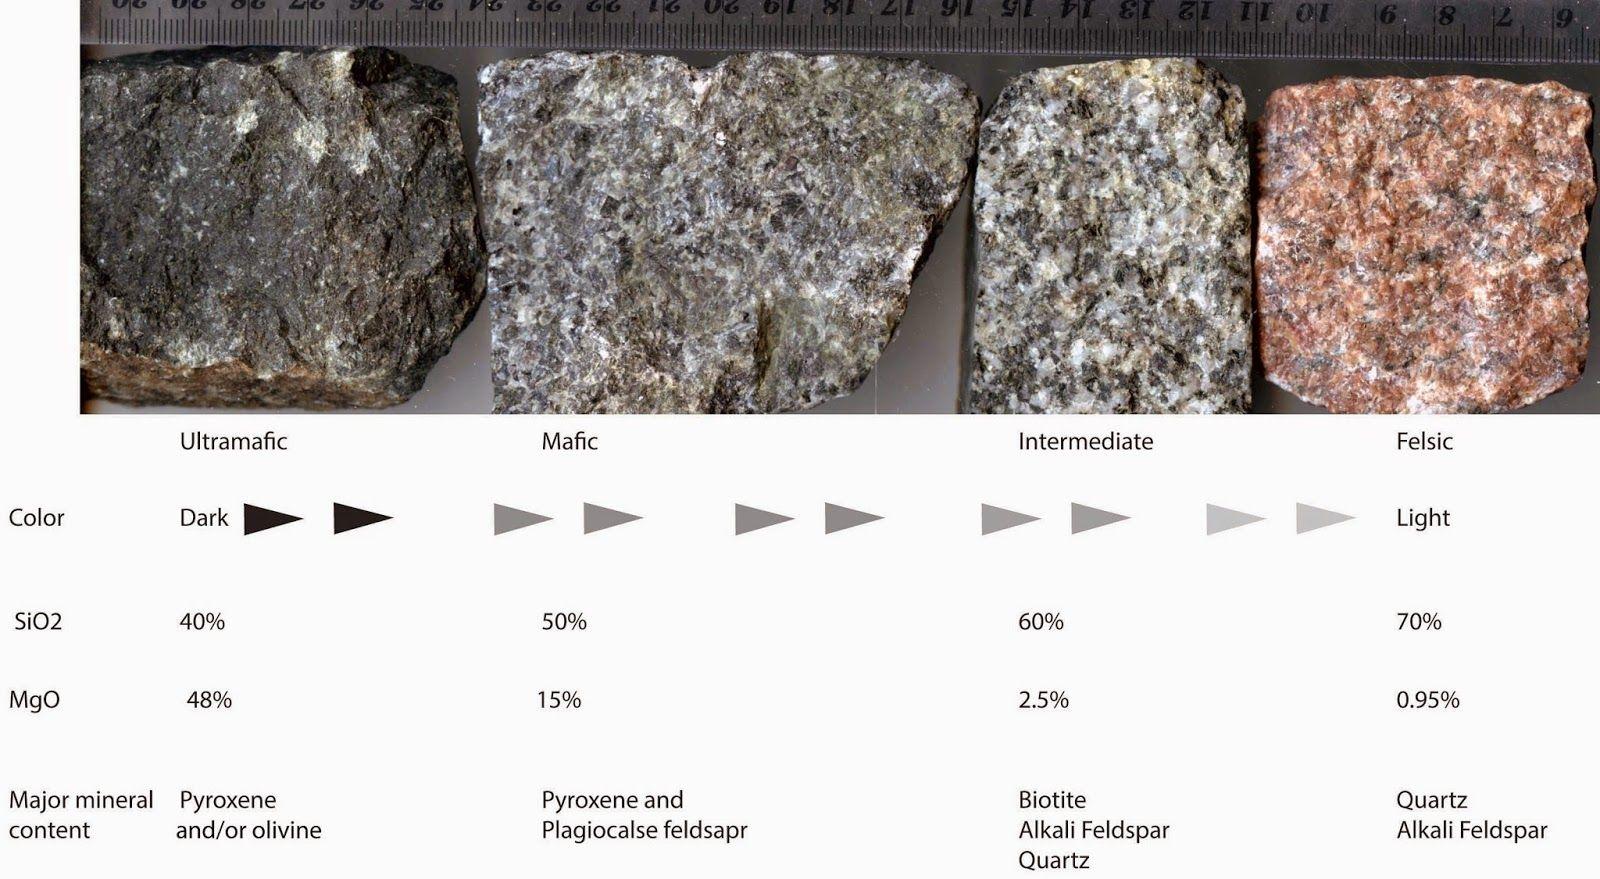 How To Classify Igneous Rocks Into Ultramafic Mafic